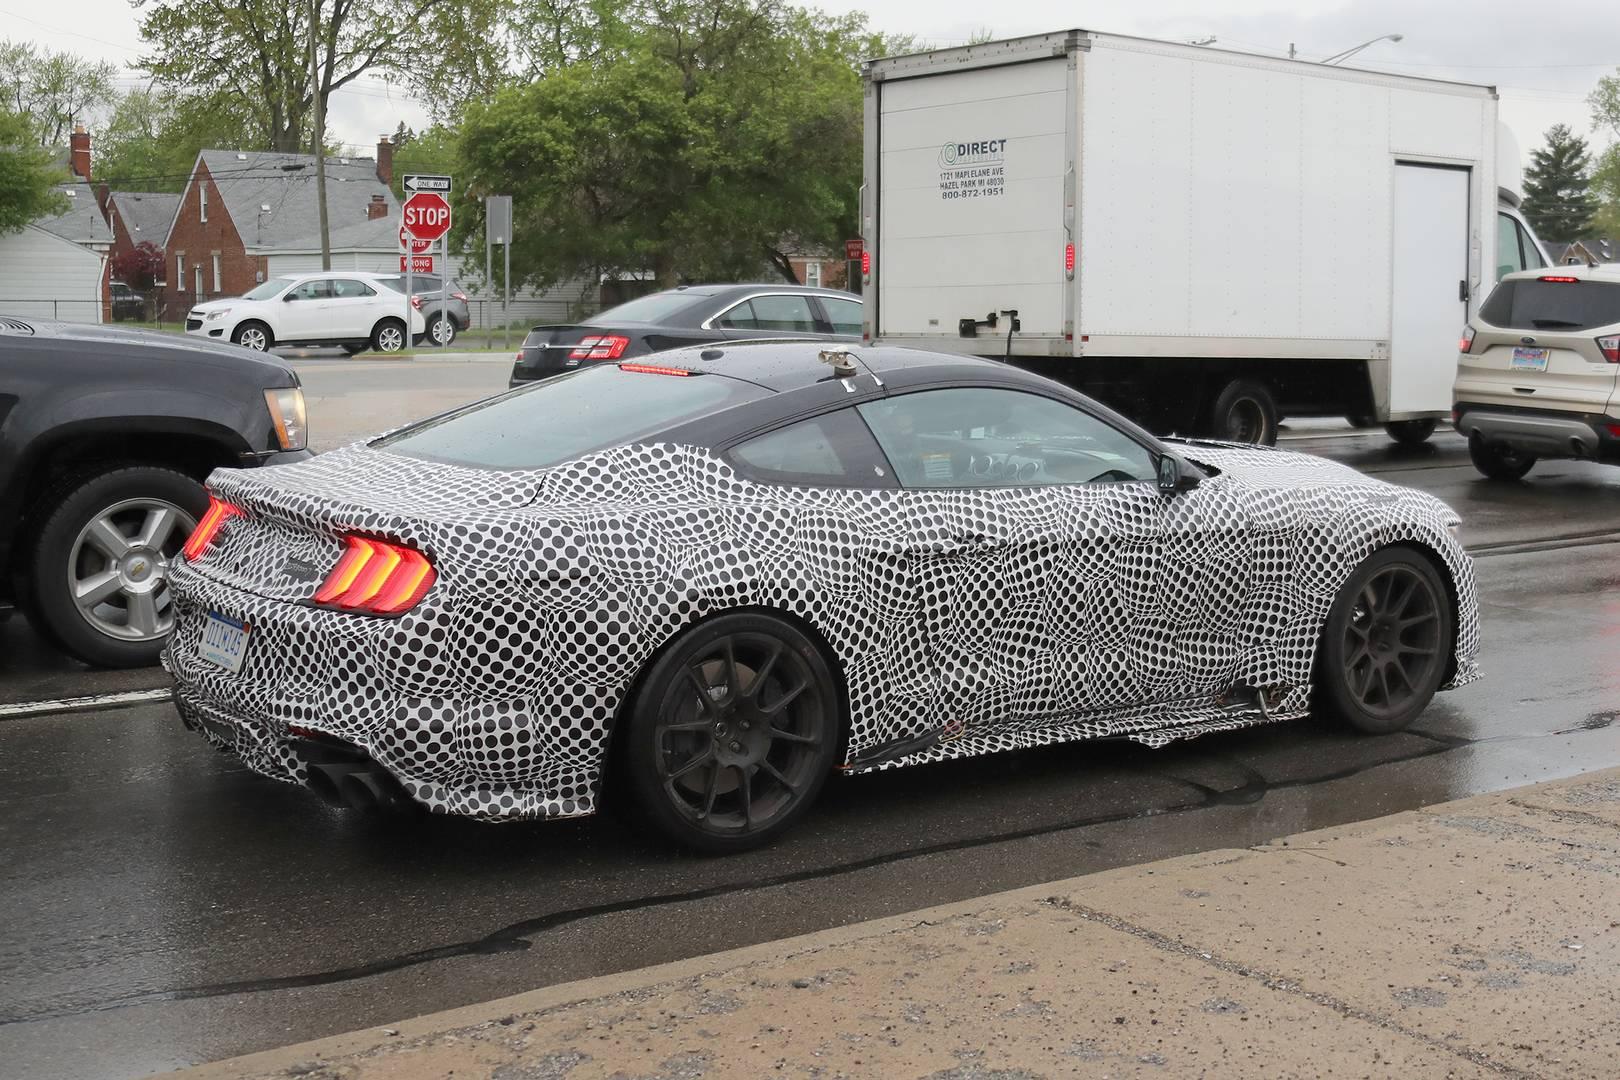 2019 Ford Mustang Shelby GT500 Spy Shots - GTspirit